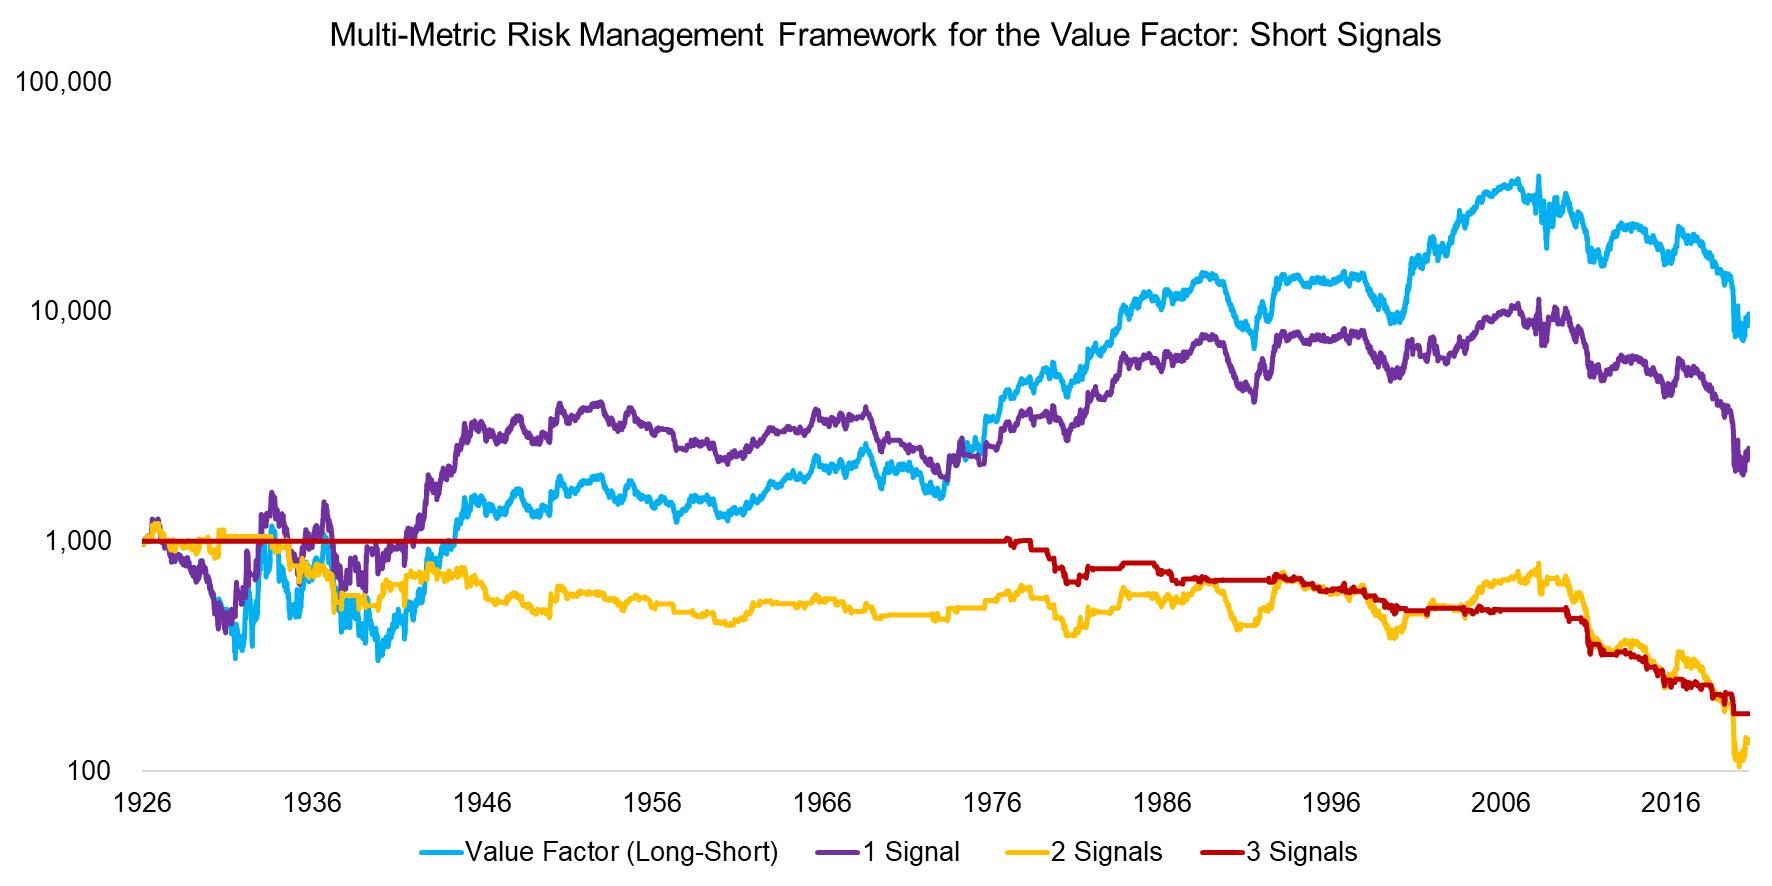 Multi-Metric Risk Management Framework for the Value Factor Short Signals